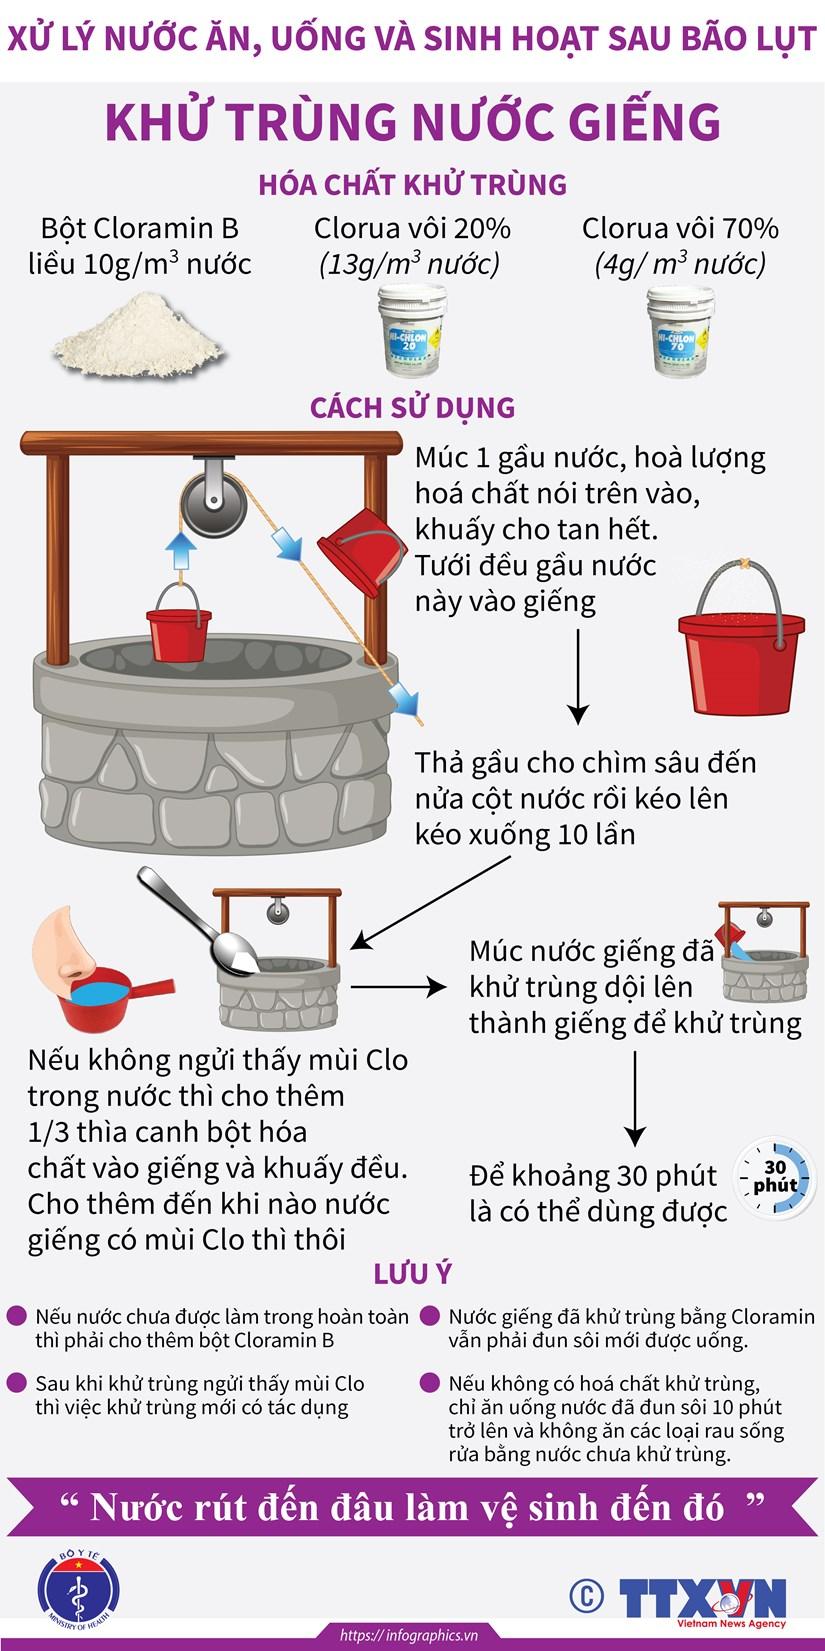 [Infographics] Xu ly nuoc an, uong va sinh hoat sau bao lut hinh anh 4